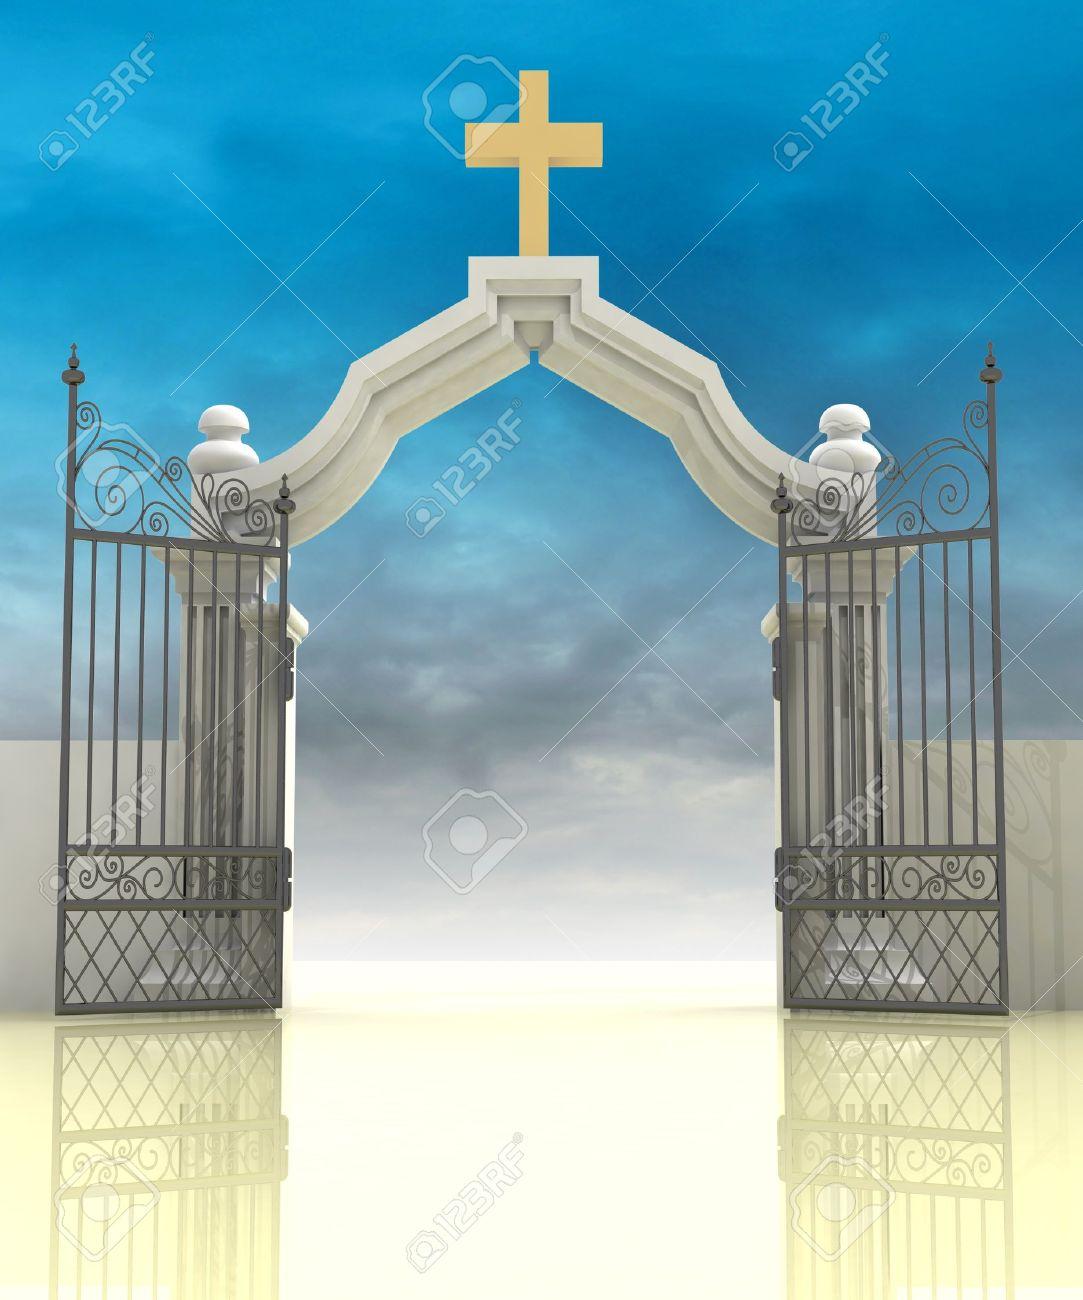 1083x1300 Opened Entrance To Paradise With Sky Illustration Stock Photo